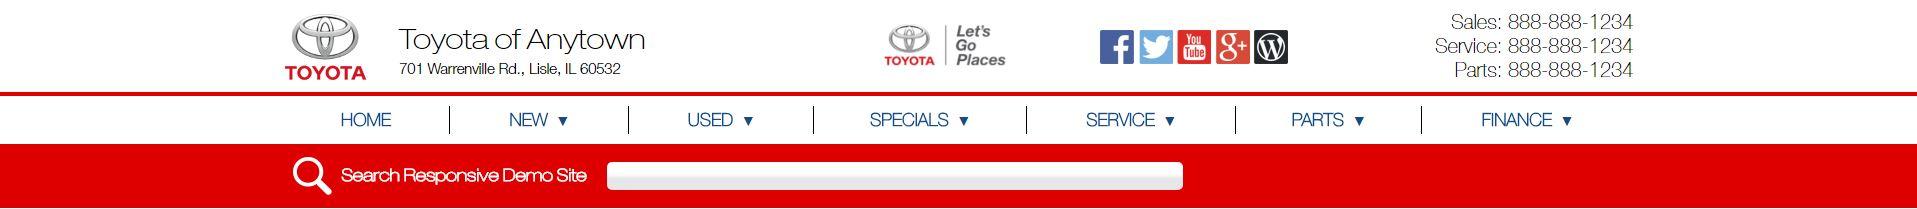 Toyota website header, option 6